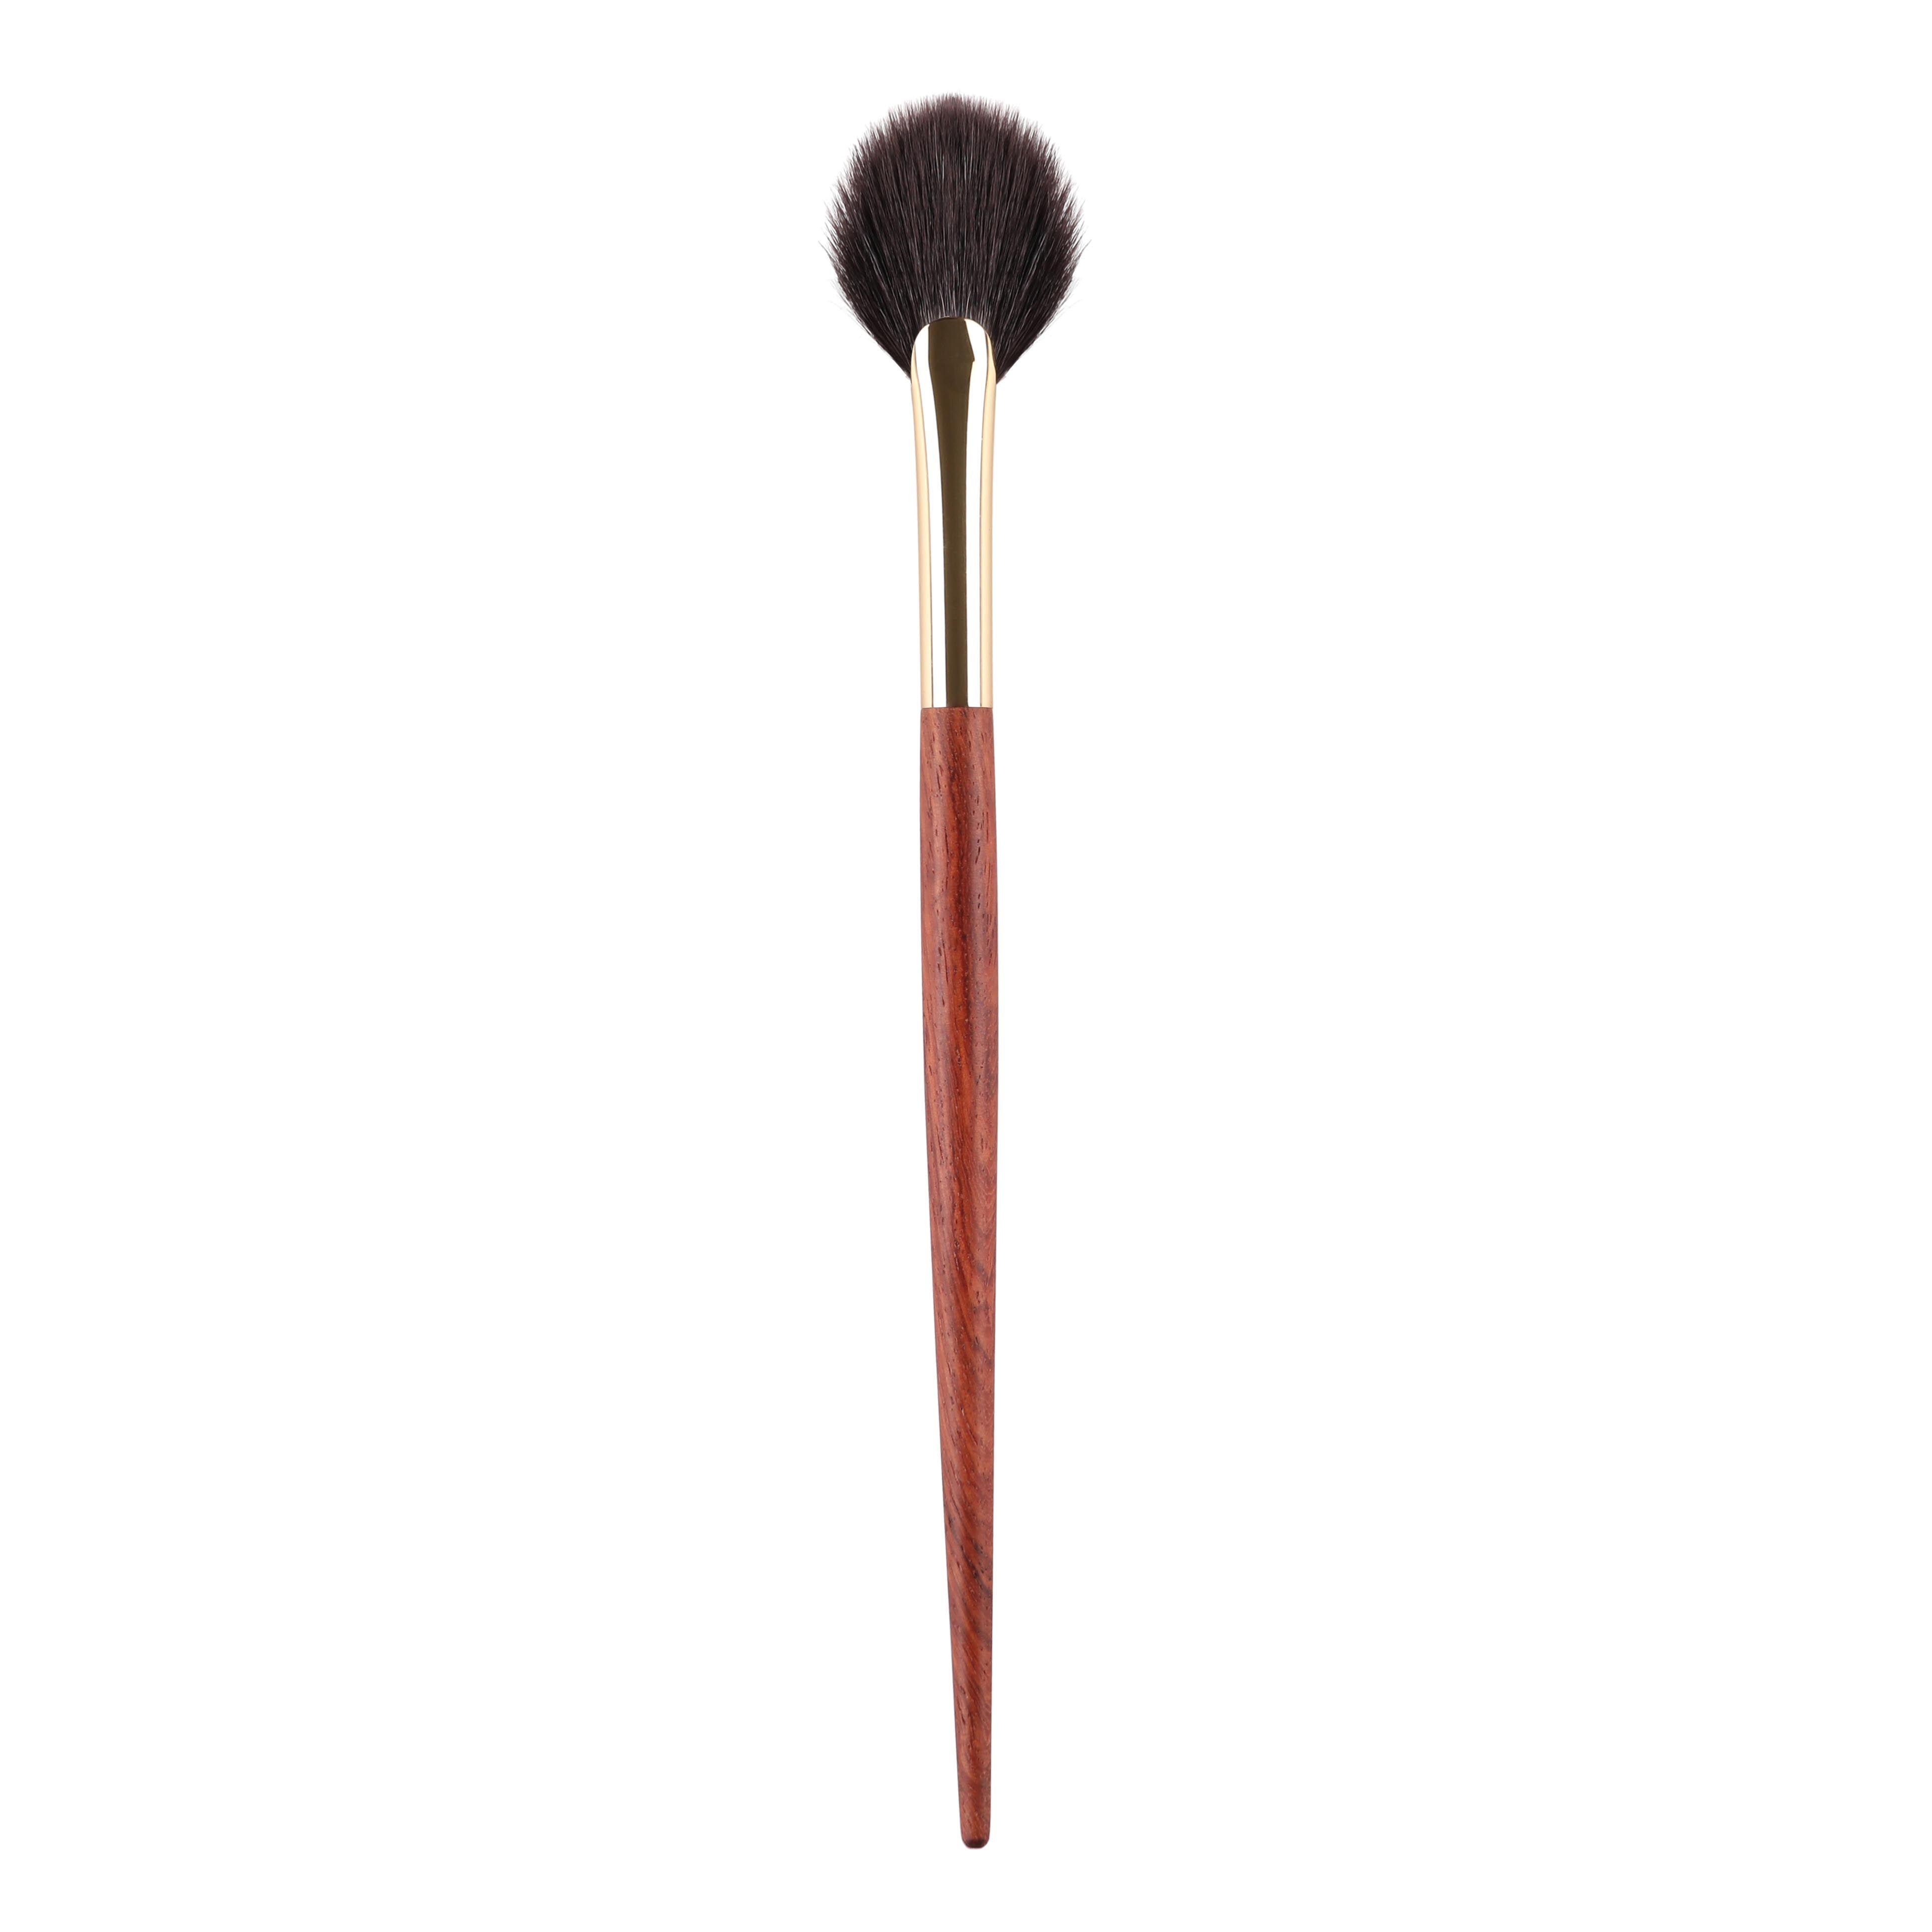 Vonira Beauty Private Label Makeup Brush Manufacturer